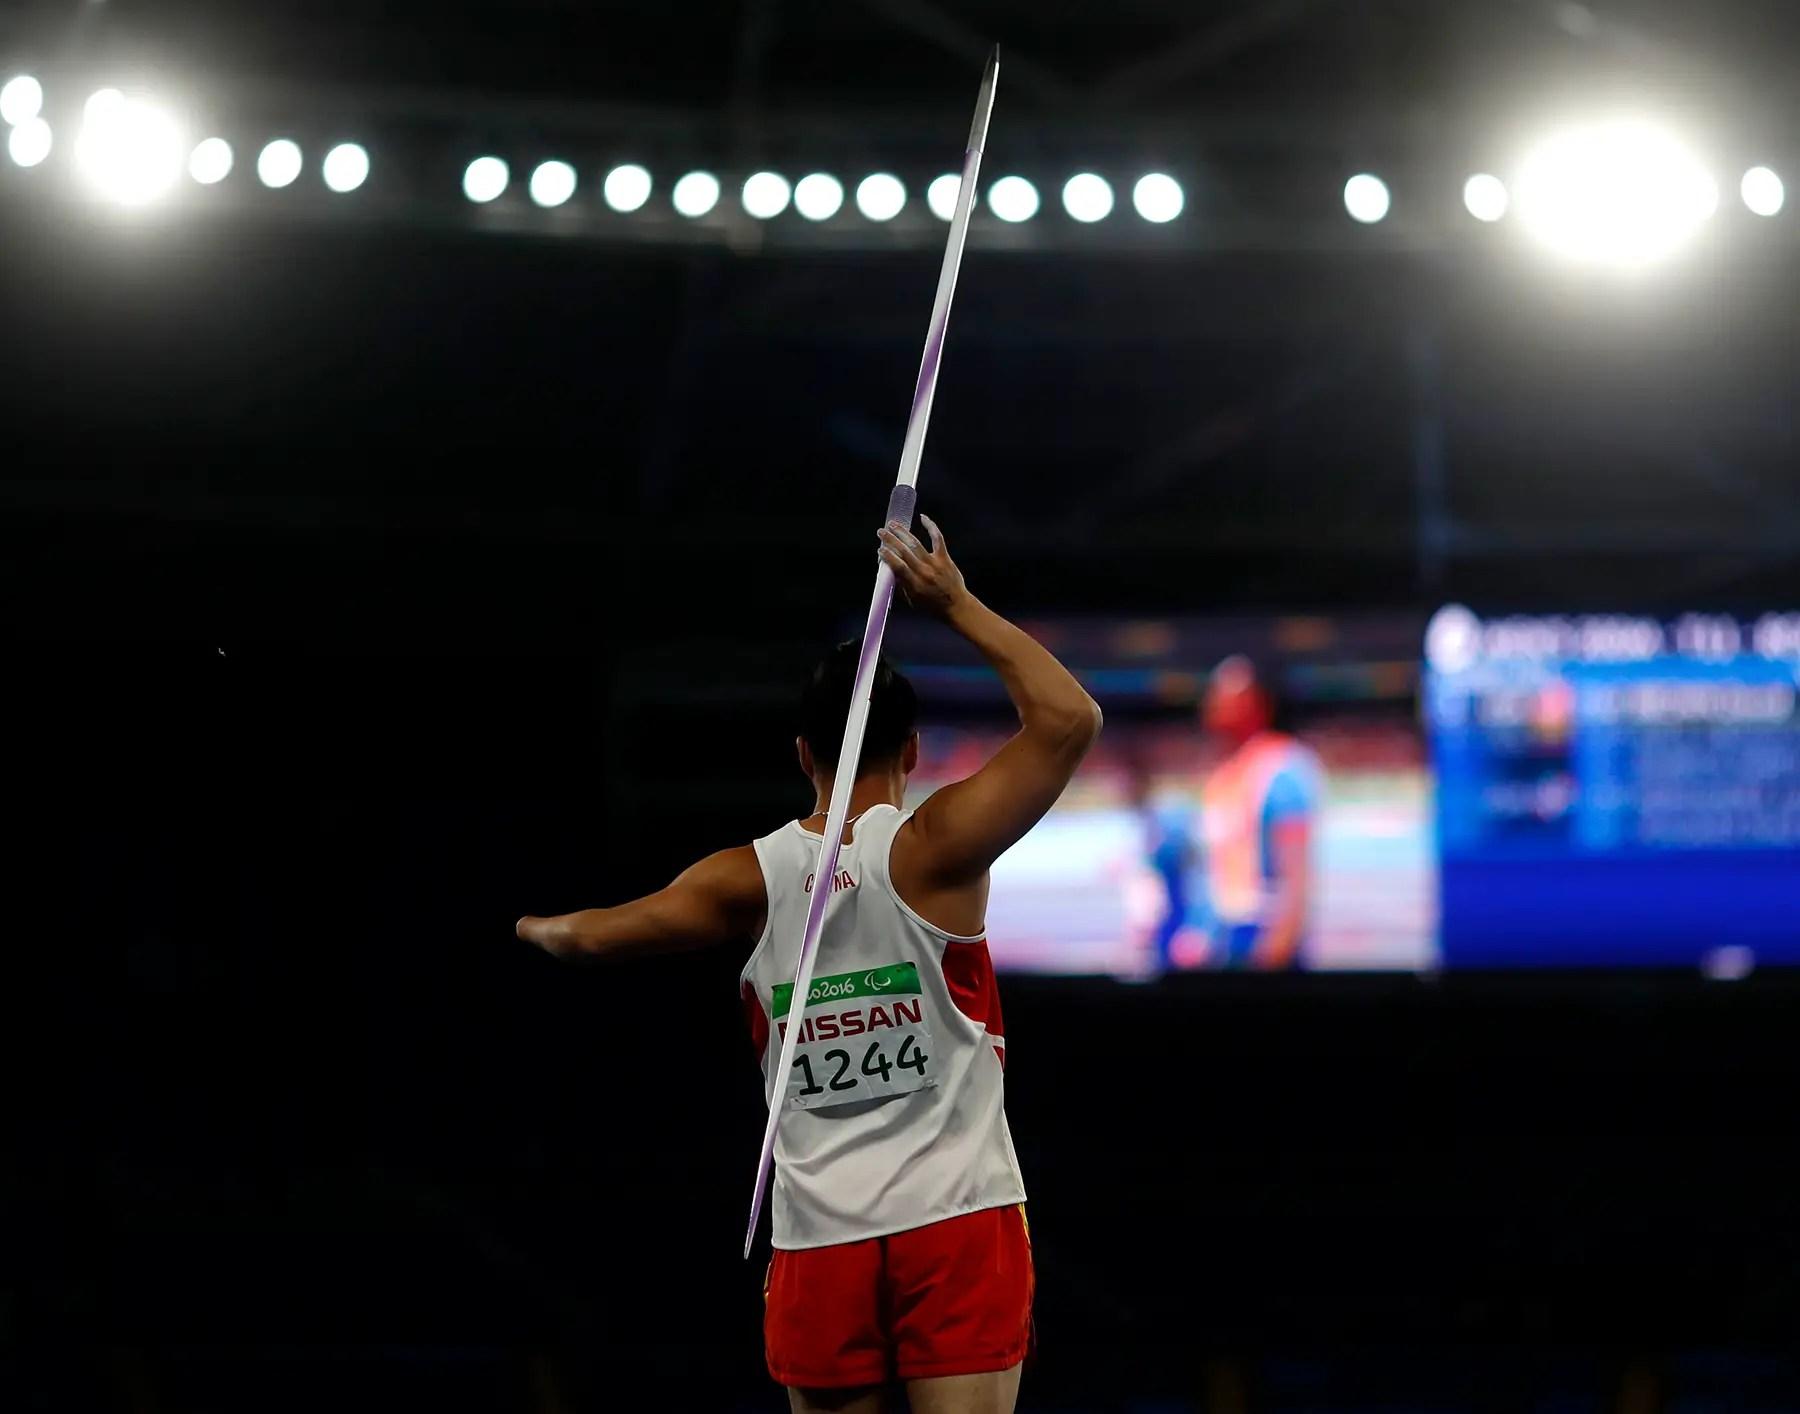 Guo Liang Chun de China compite en lanzamiento de jabalina masculino.